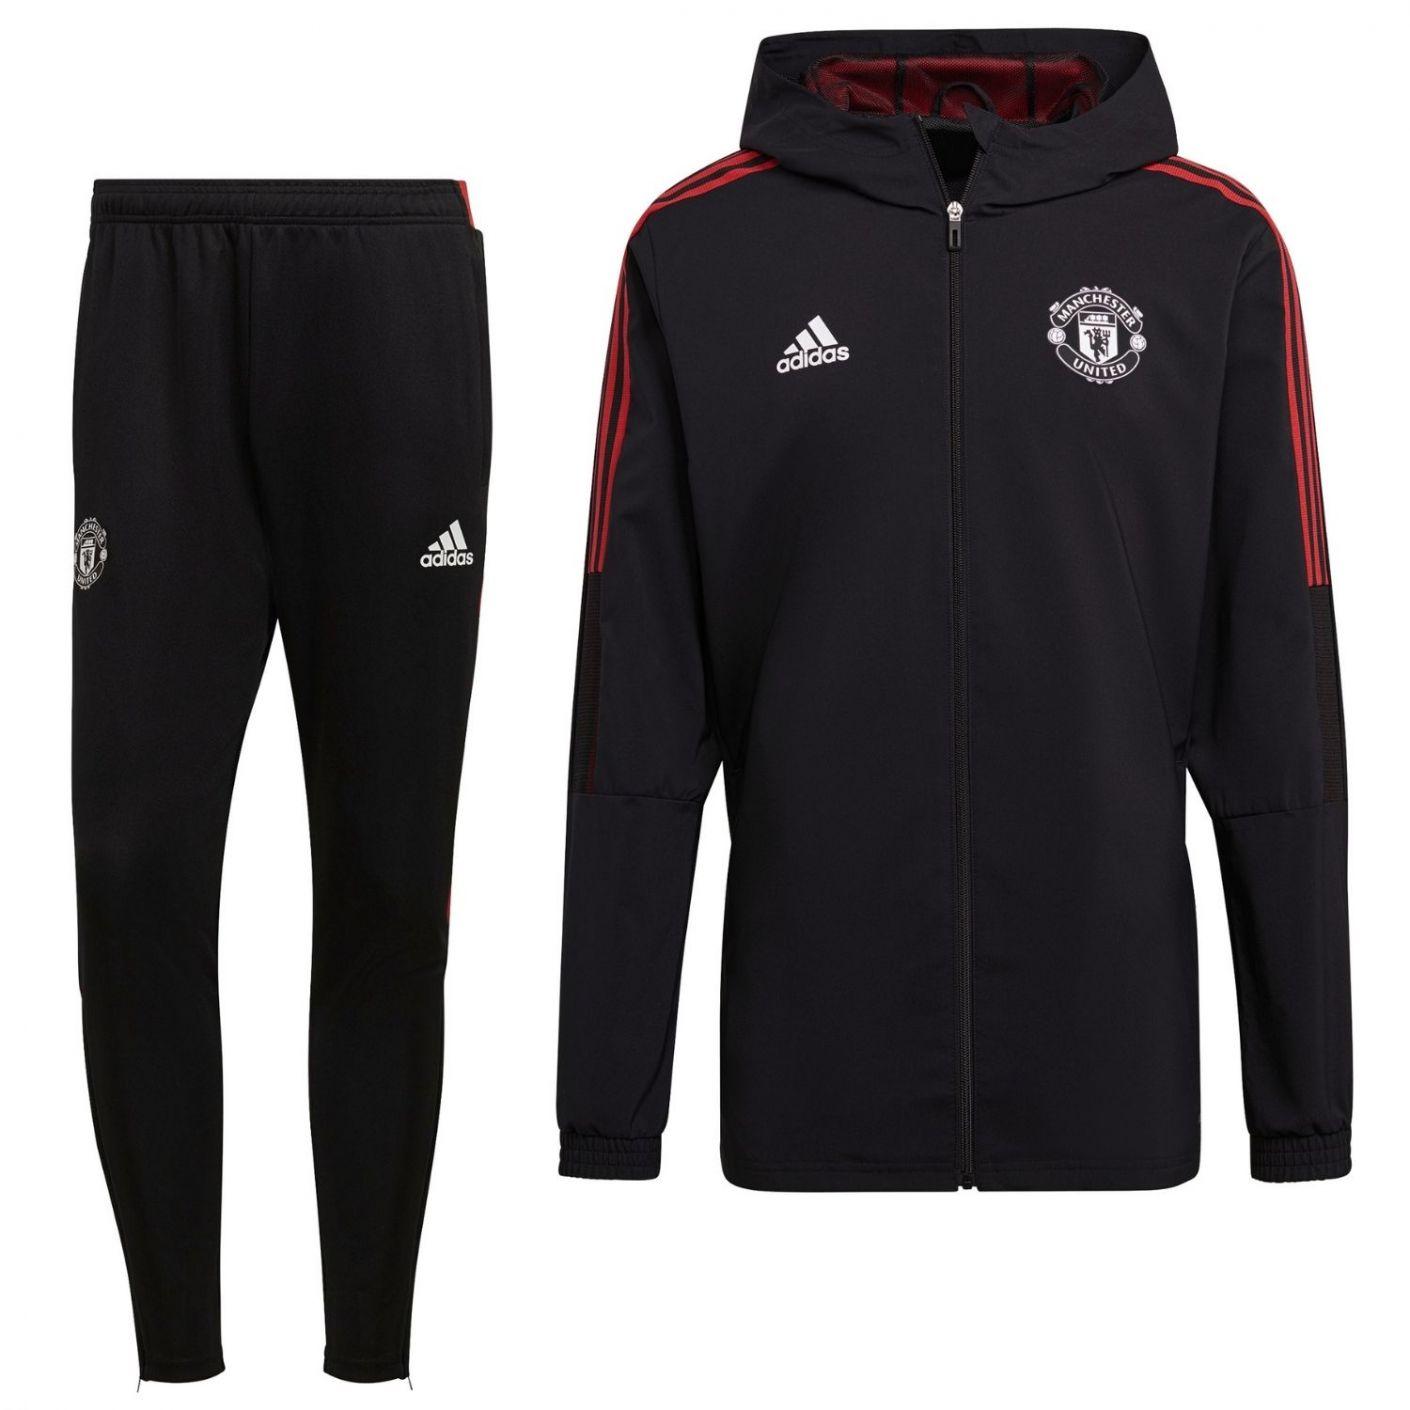 adidas Manchester United Presentatie Trainingspak 2021-2022 Zwart Rood